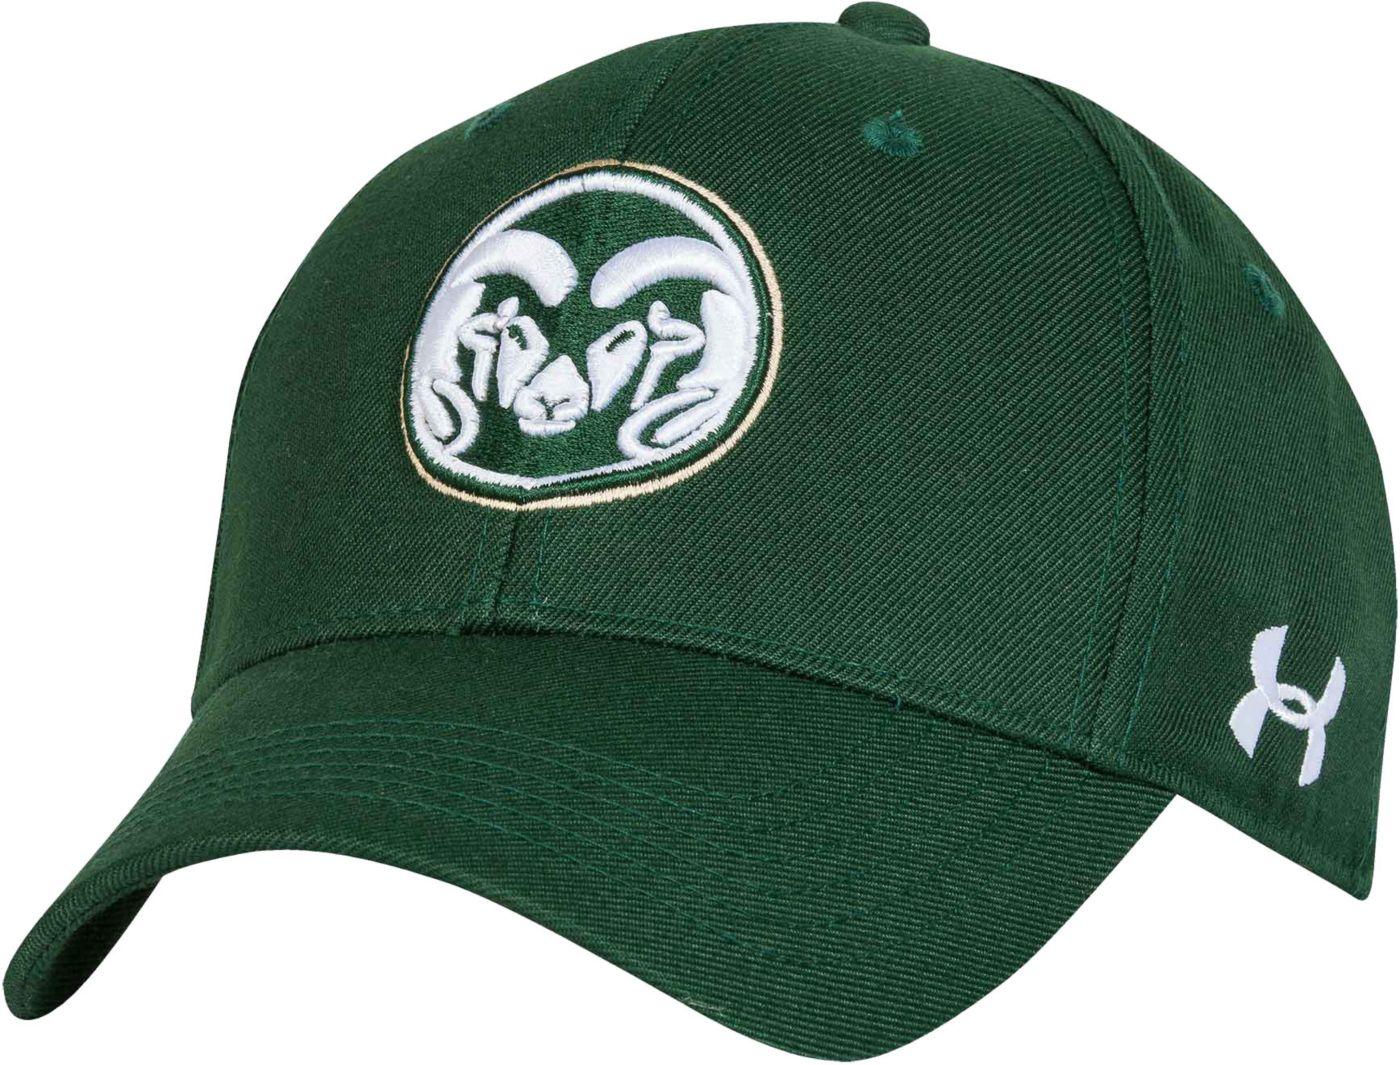 Under Armour Men's Colorado State Rams Green Adjustable Hat